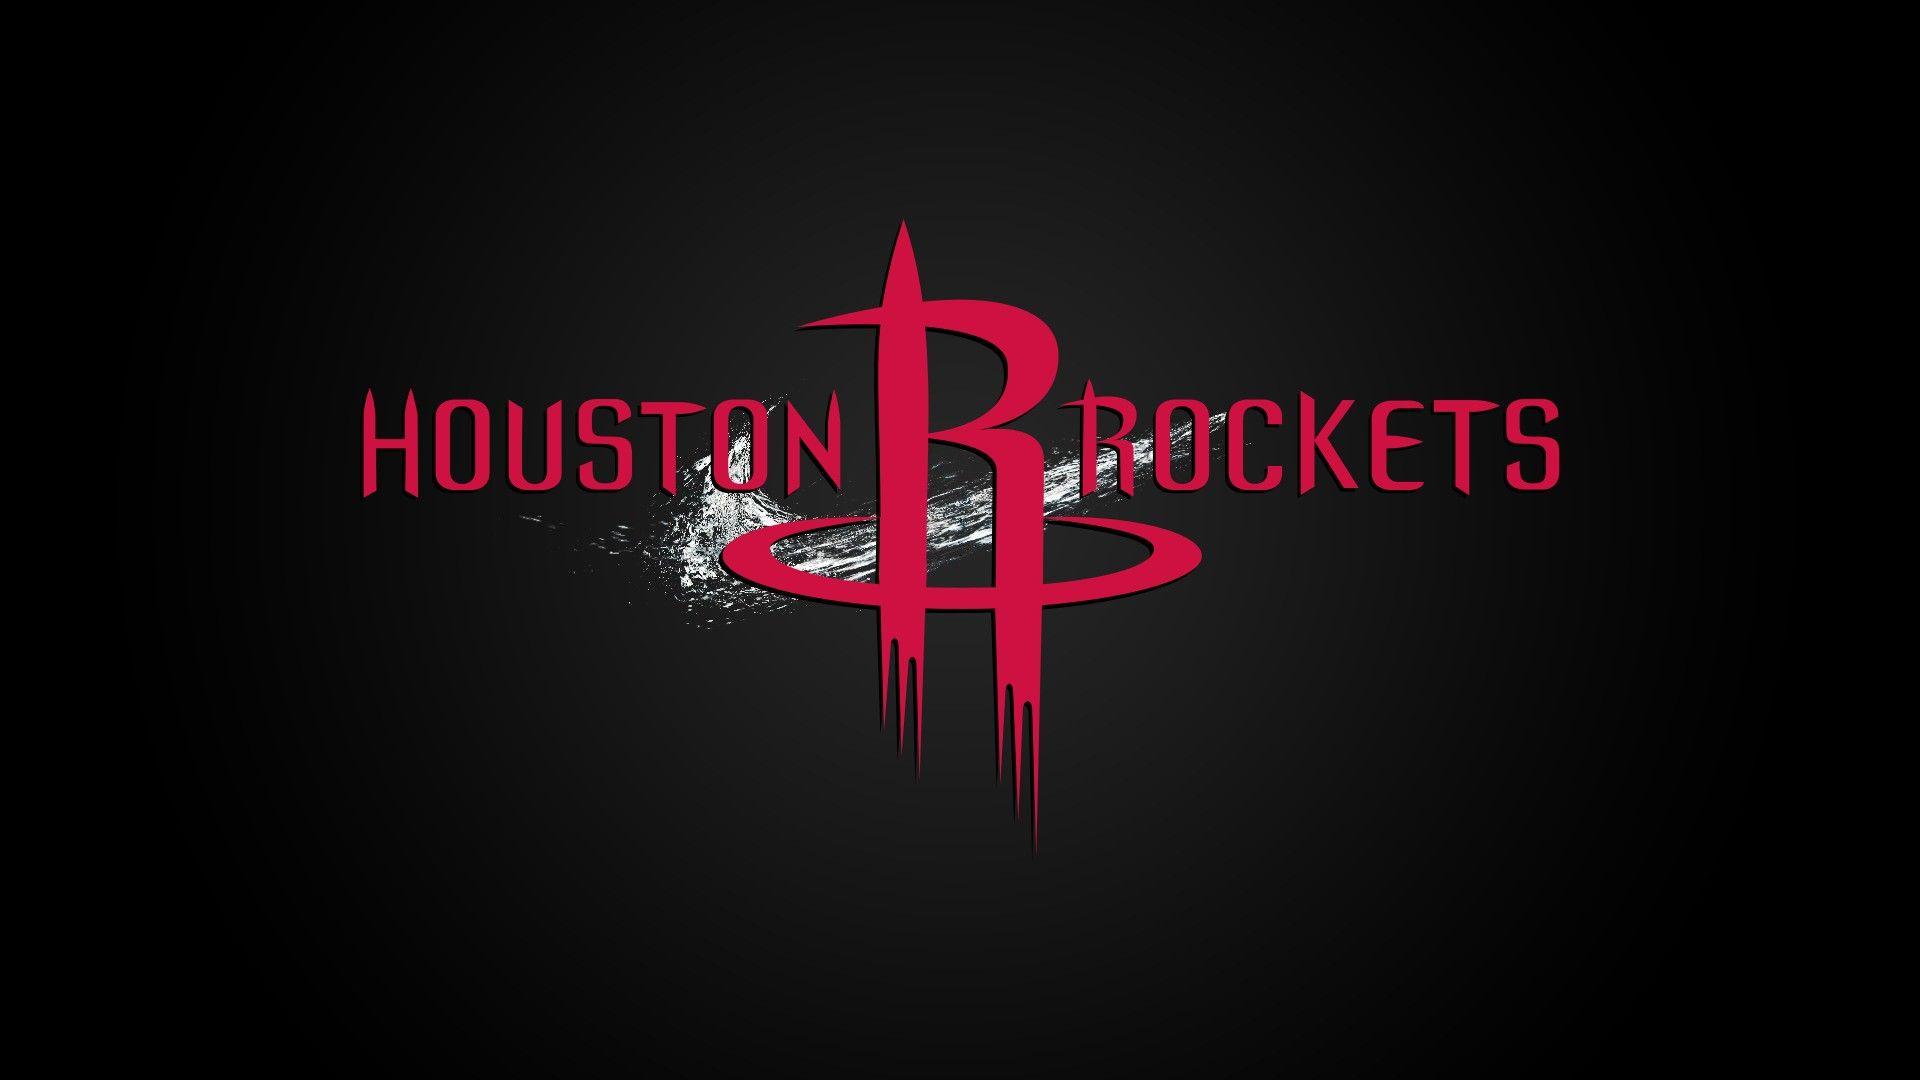 Rockets Wallpaper For Mac Backgrounds Mac Backgrounds Houston Rockets Iphone Wallpaper Nba